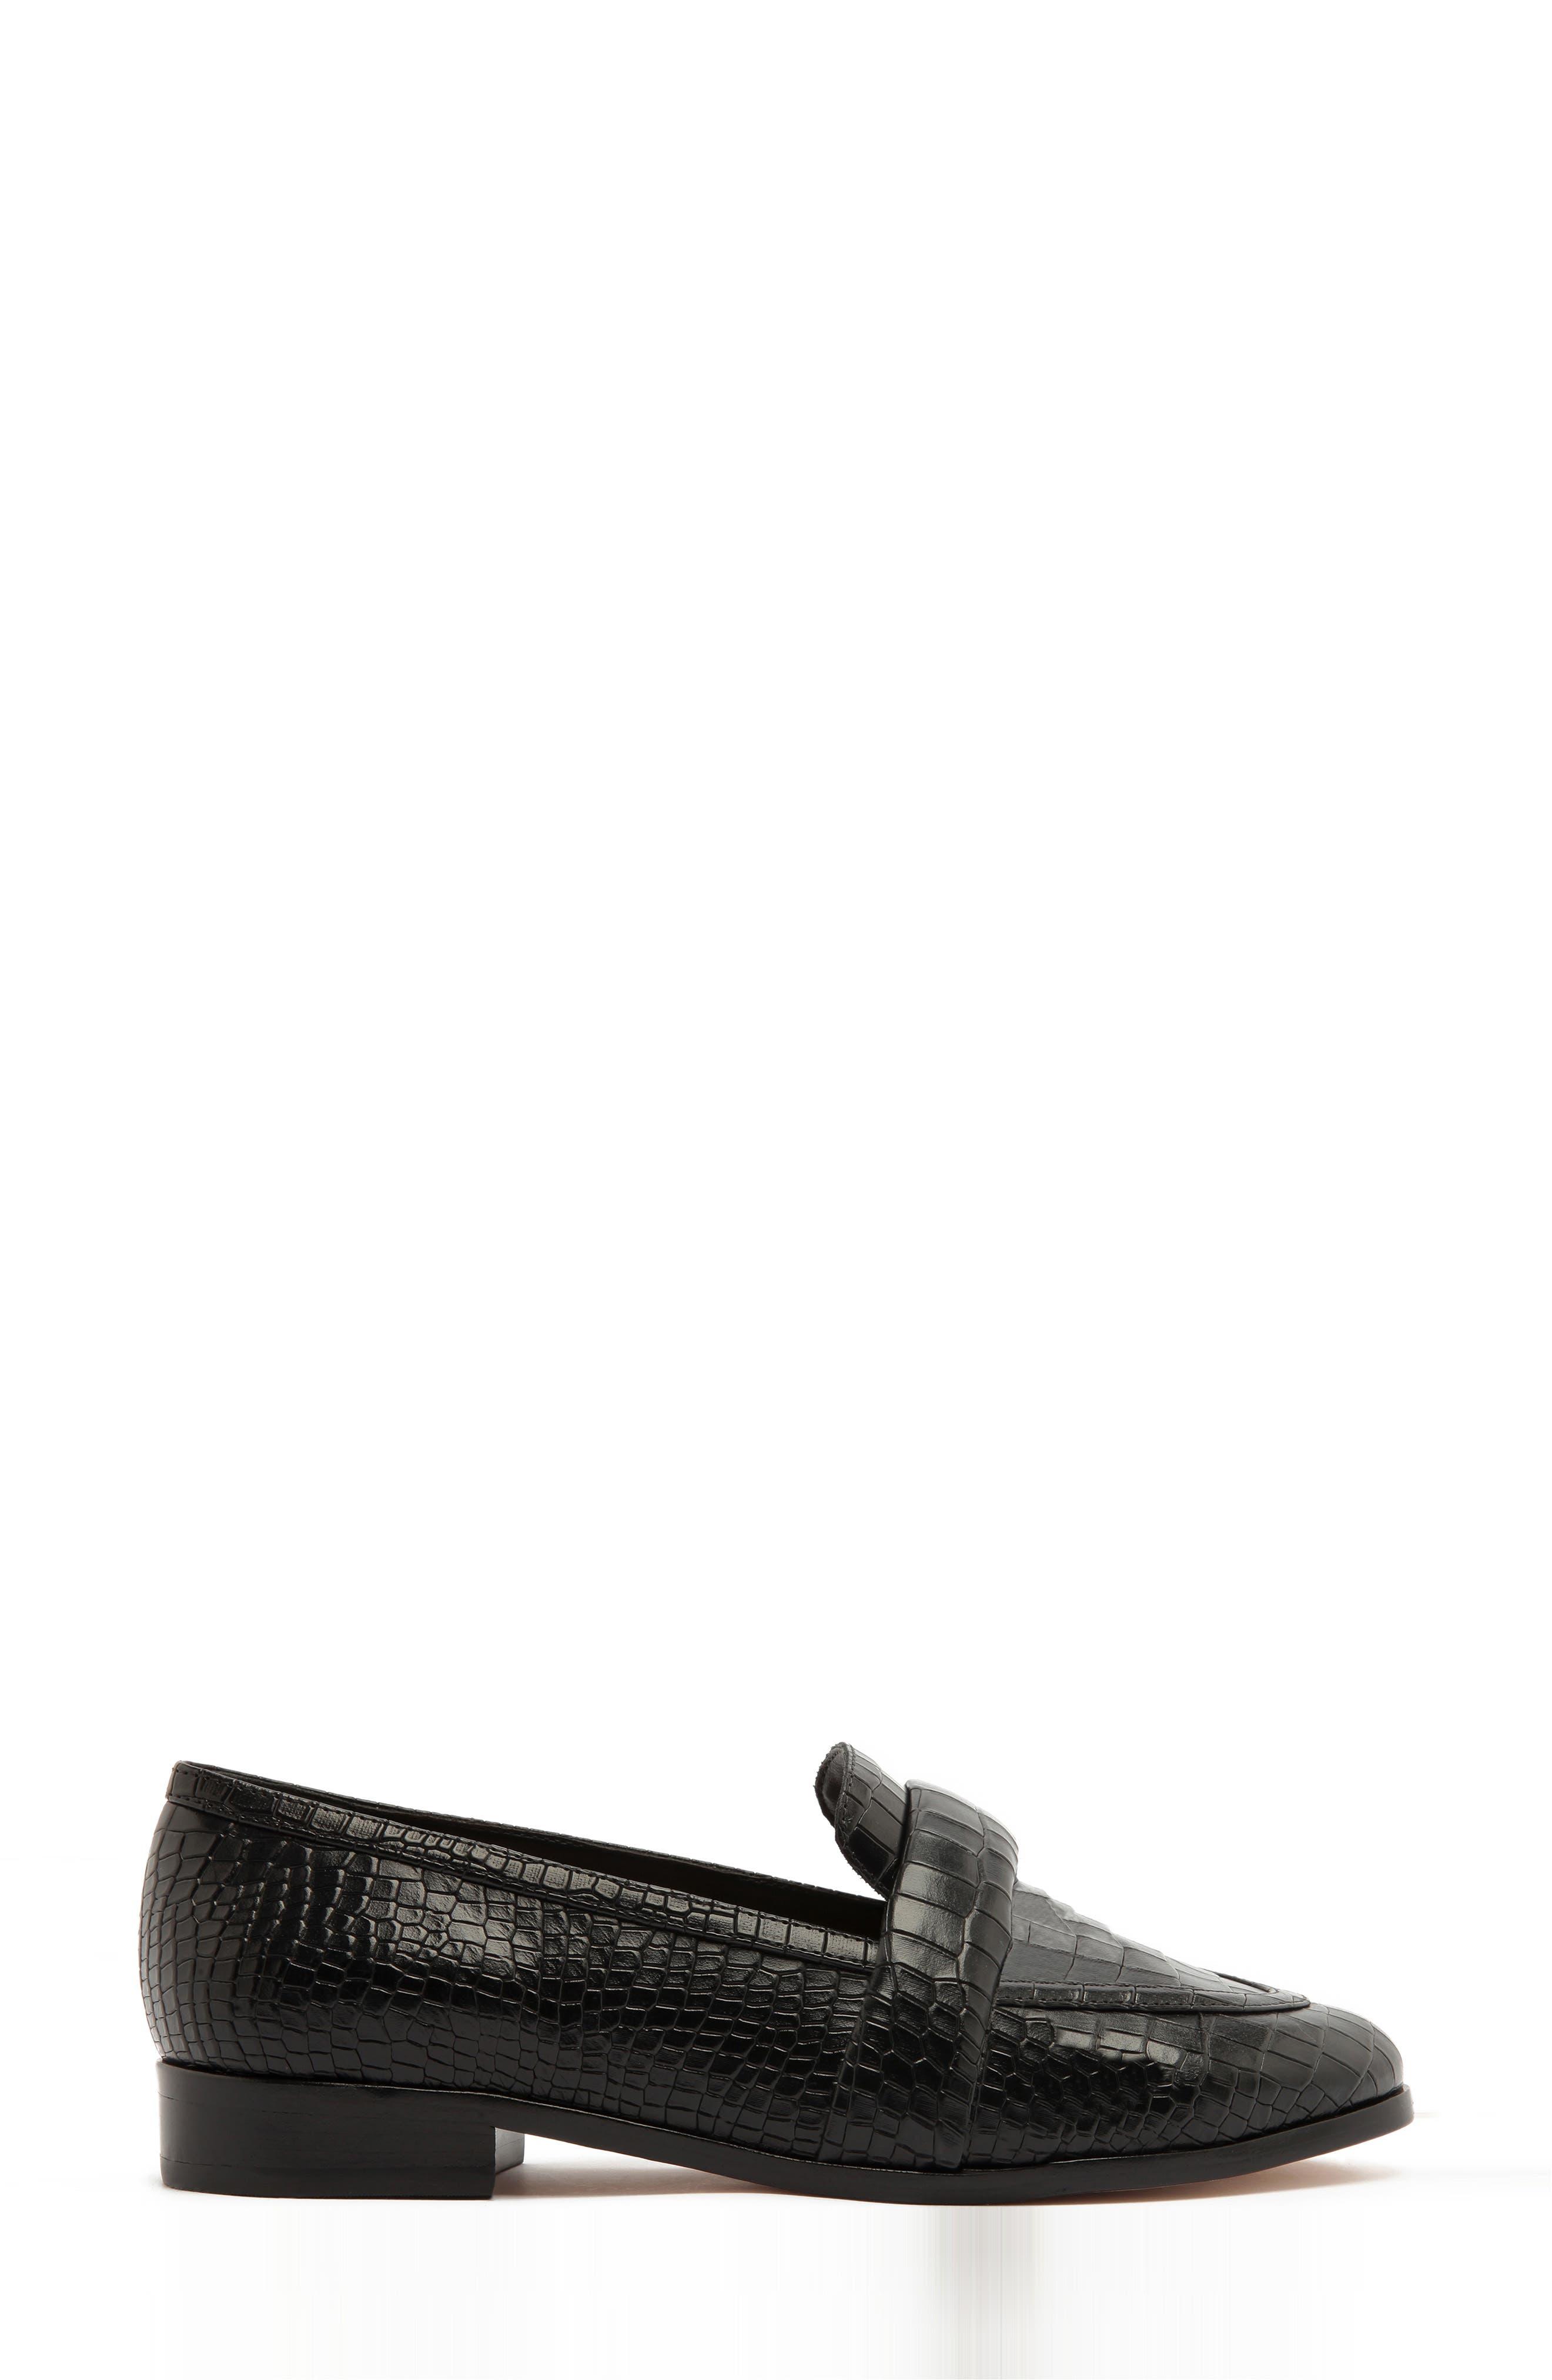 Schutz Flats Romina Croc Embossed Loafer